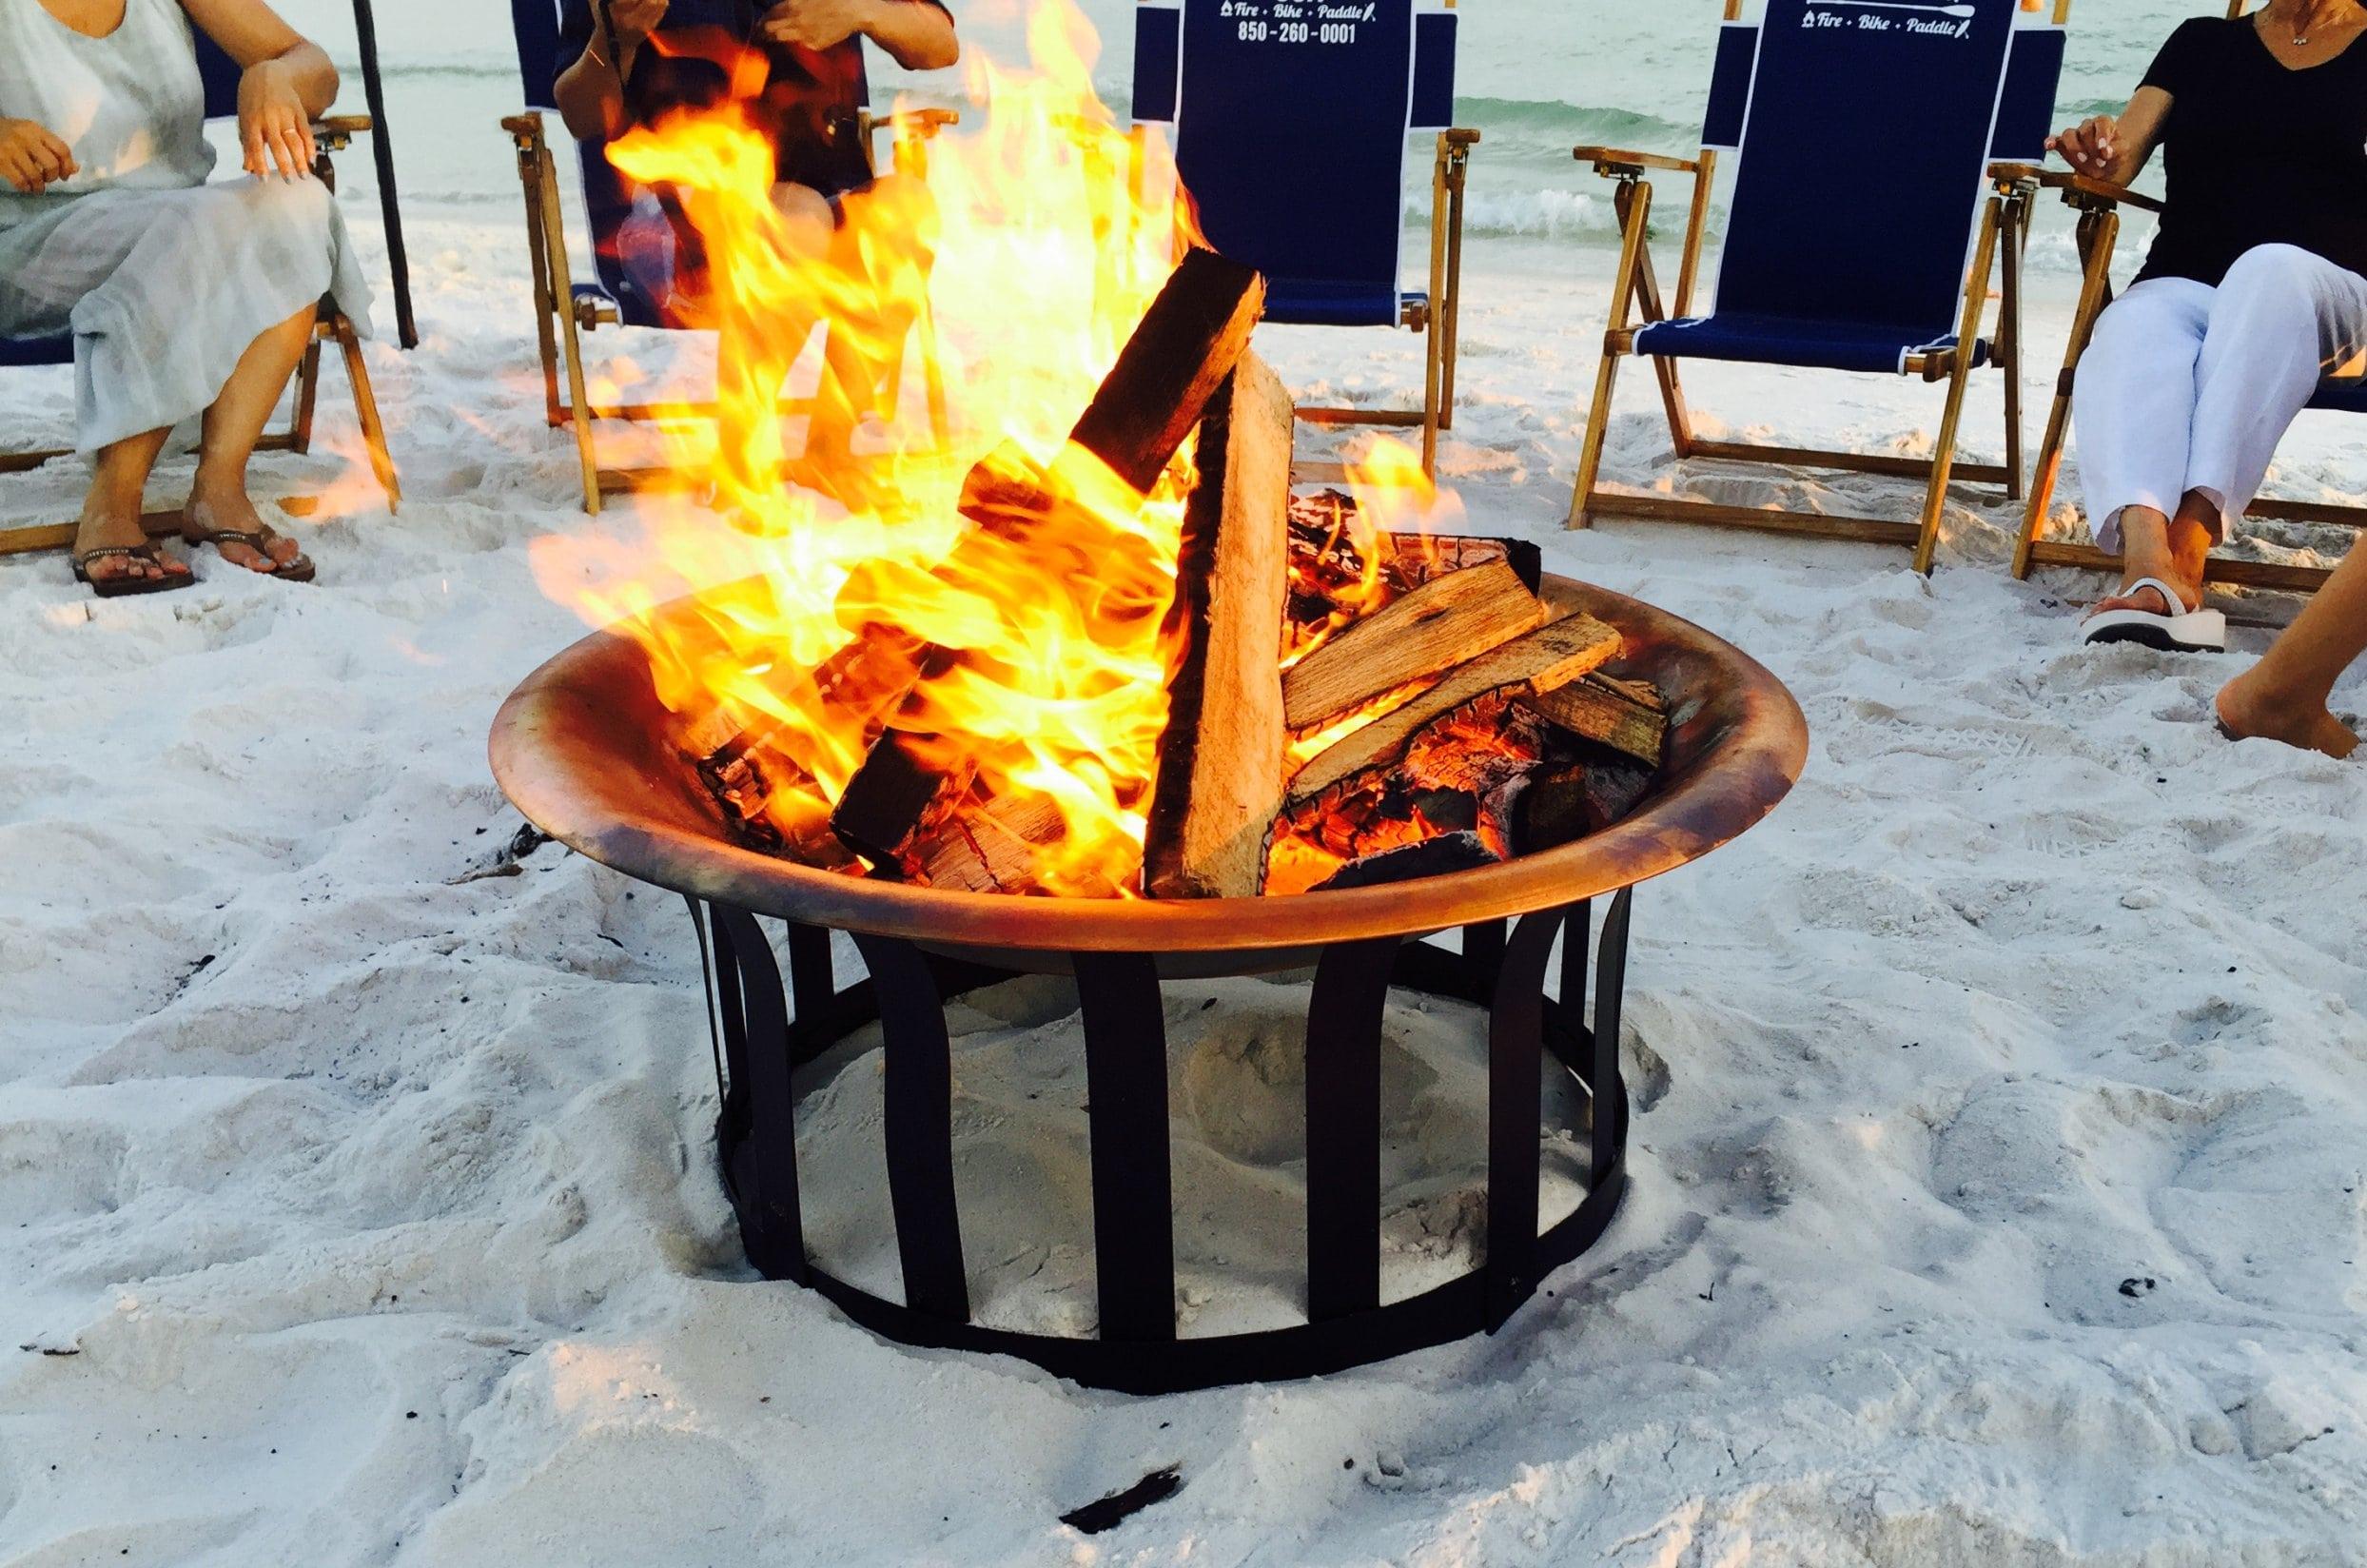 30A Beach Bonfire Services